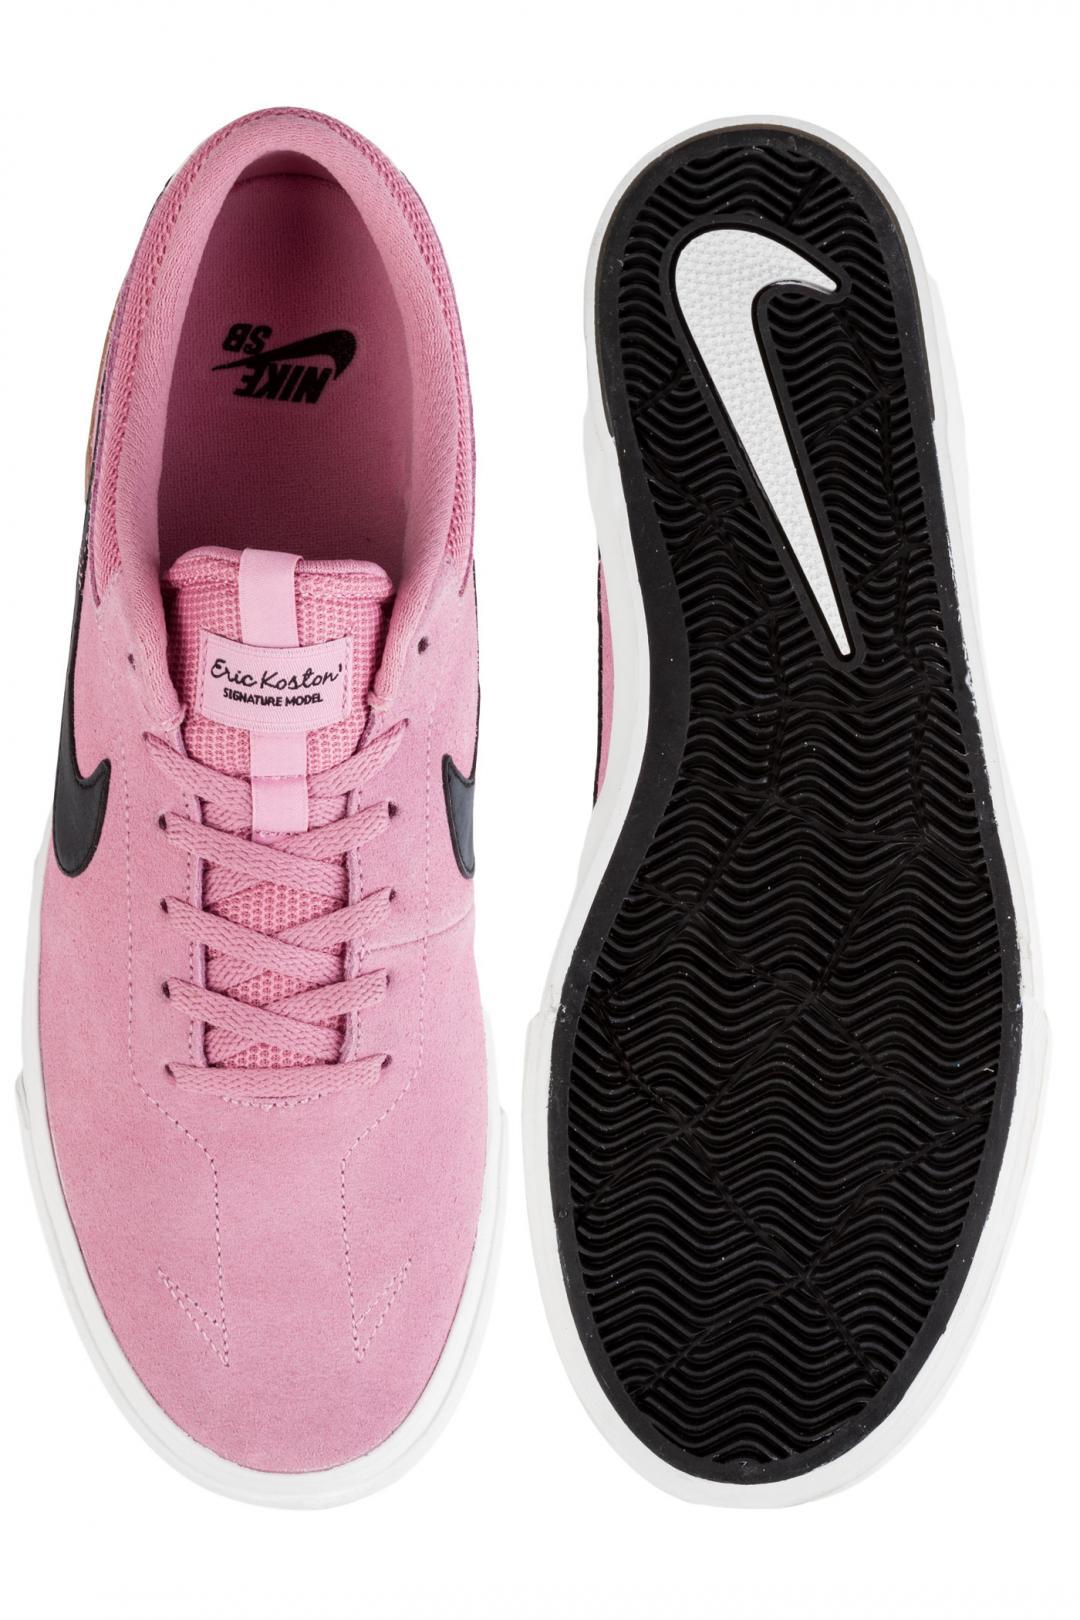 Uomo Nike SB Koston Hypervulc elemental pink black   Scarpe da skate